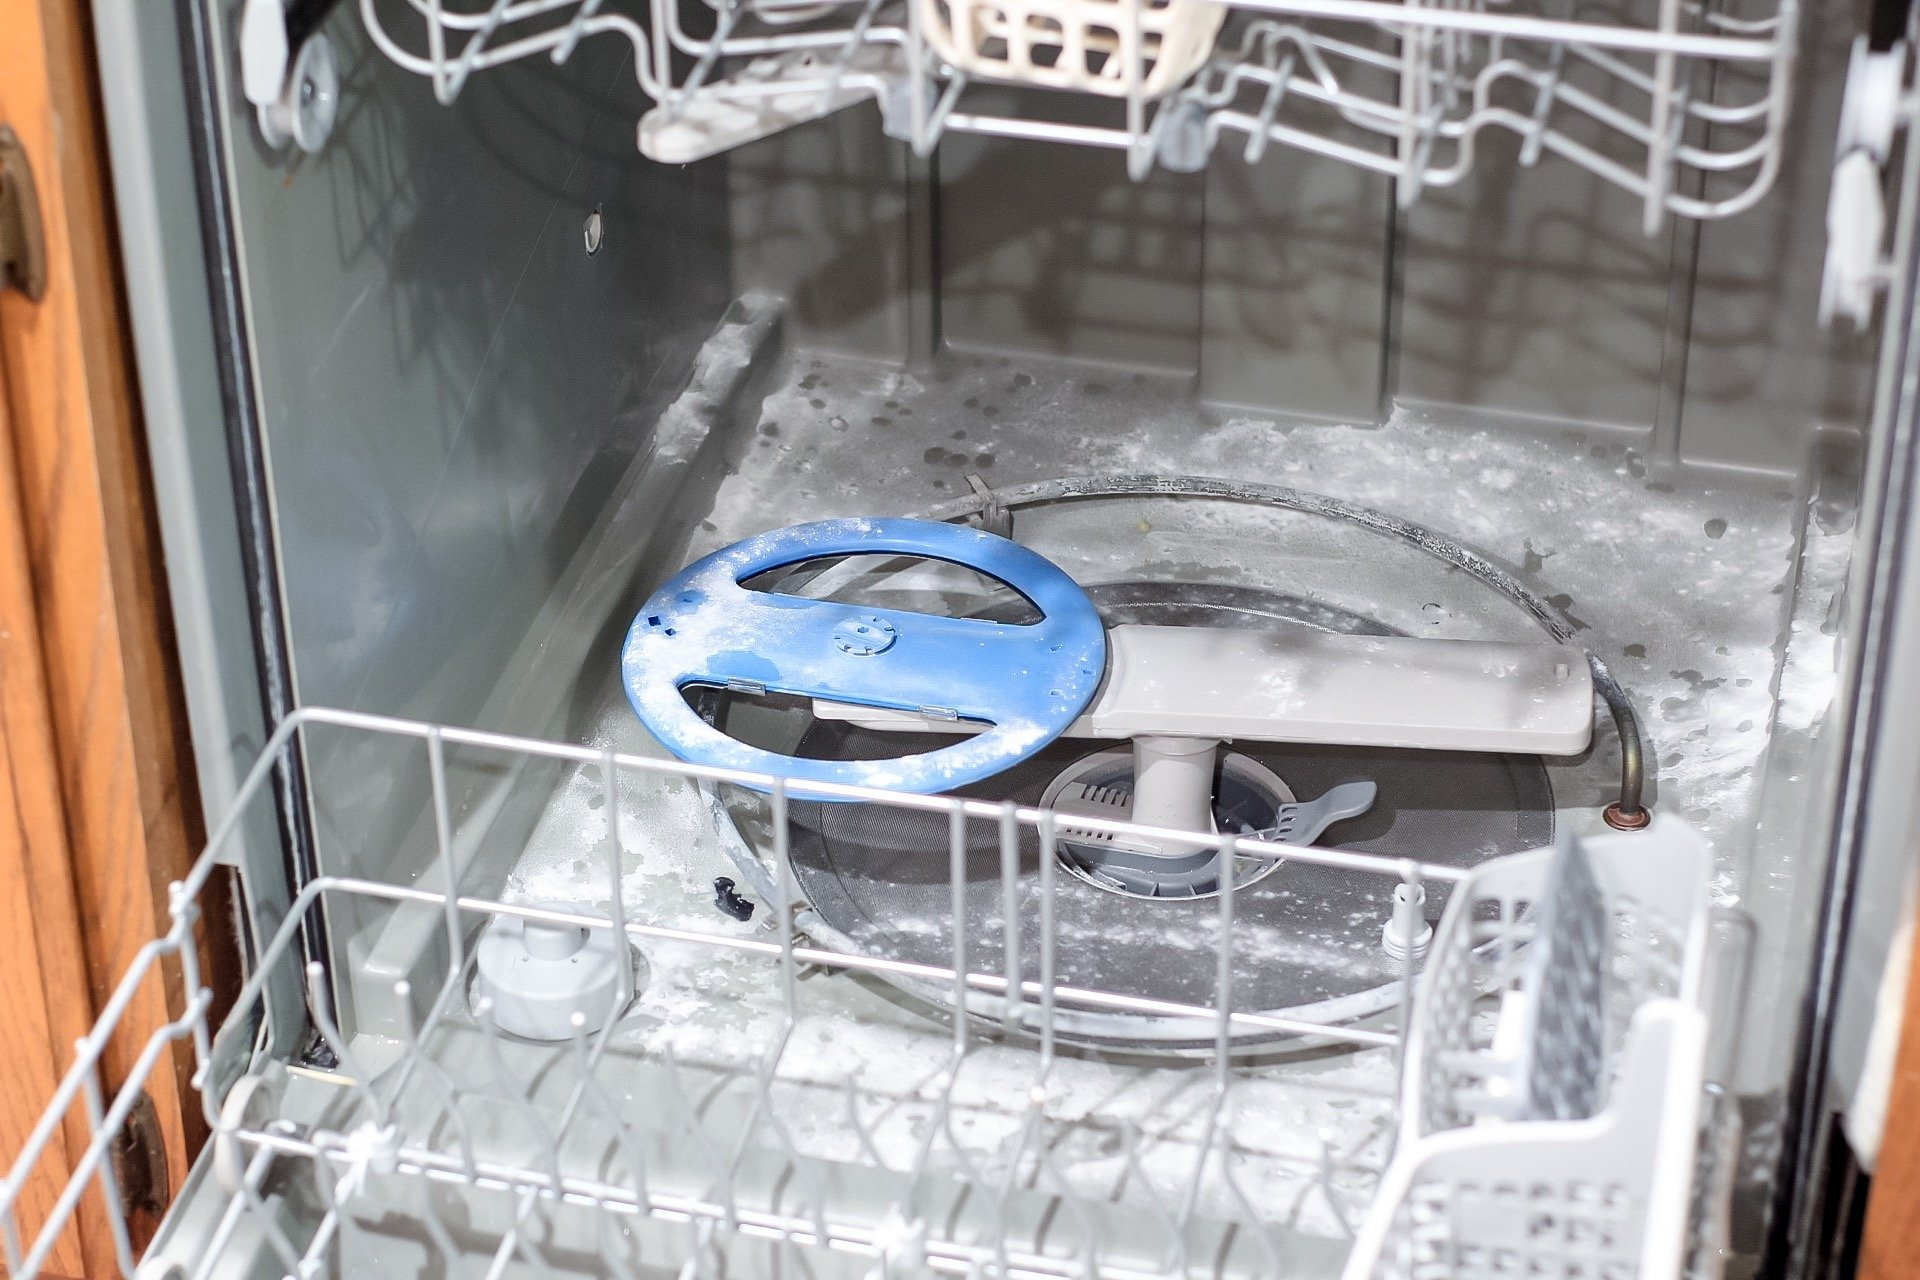 baking soda sprinkled on floor of dishwasher